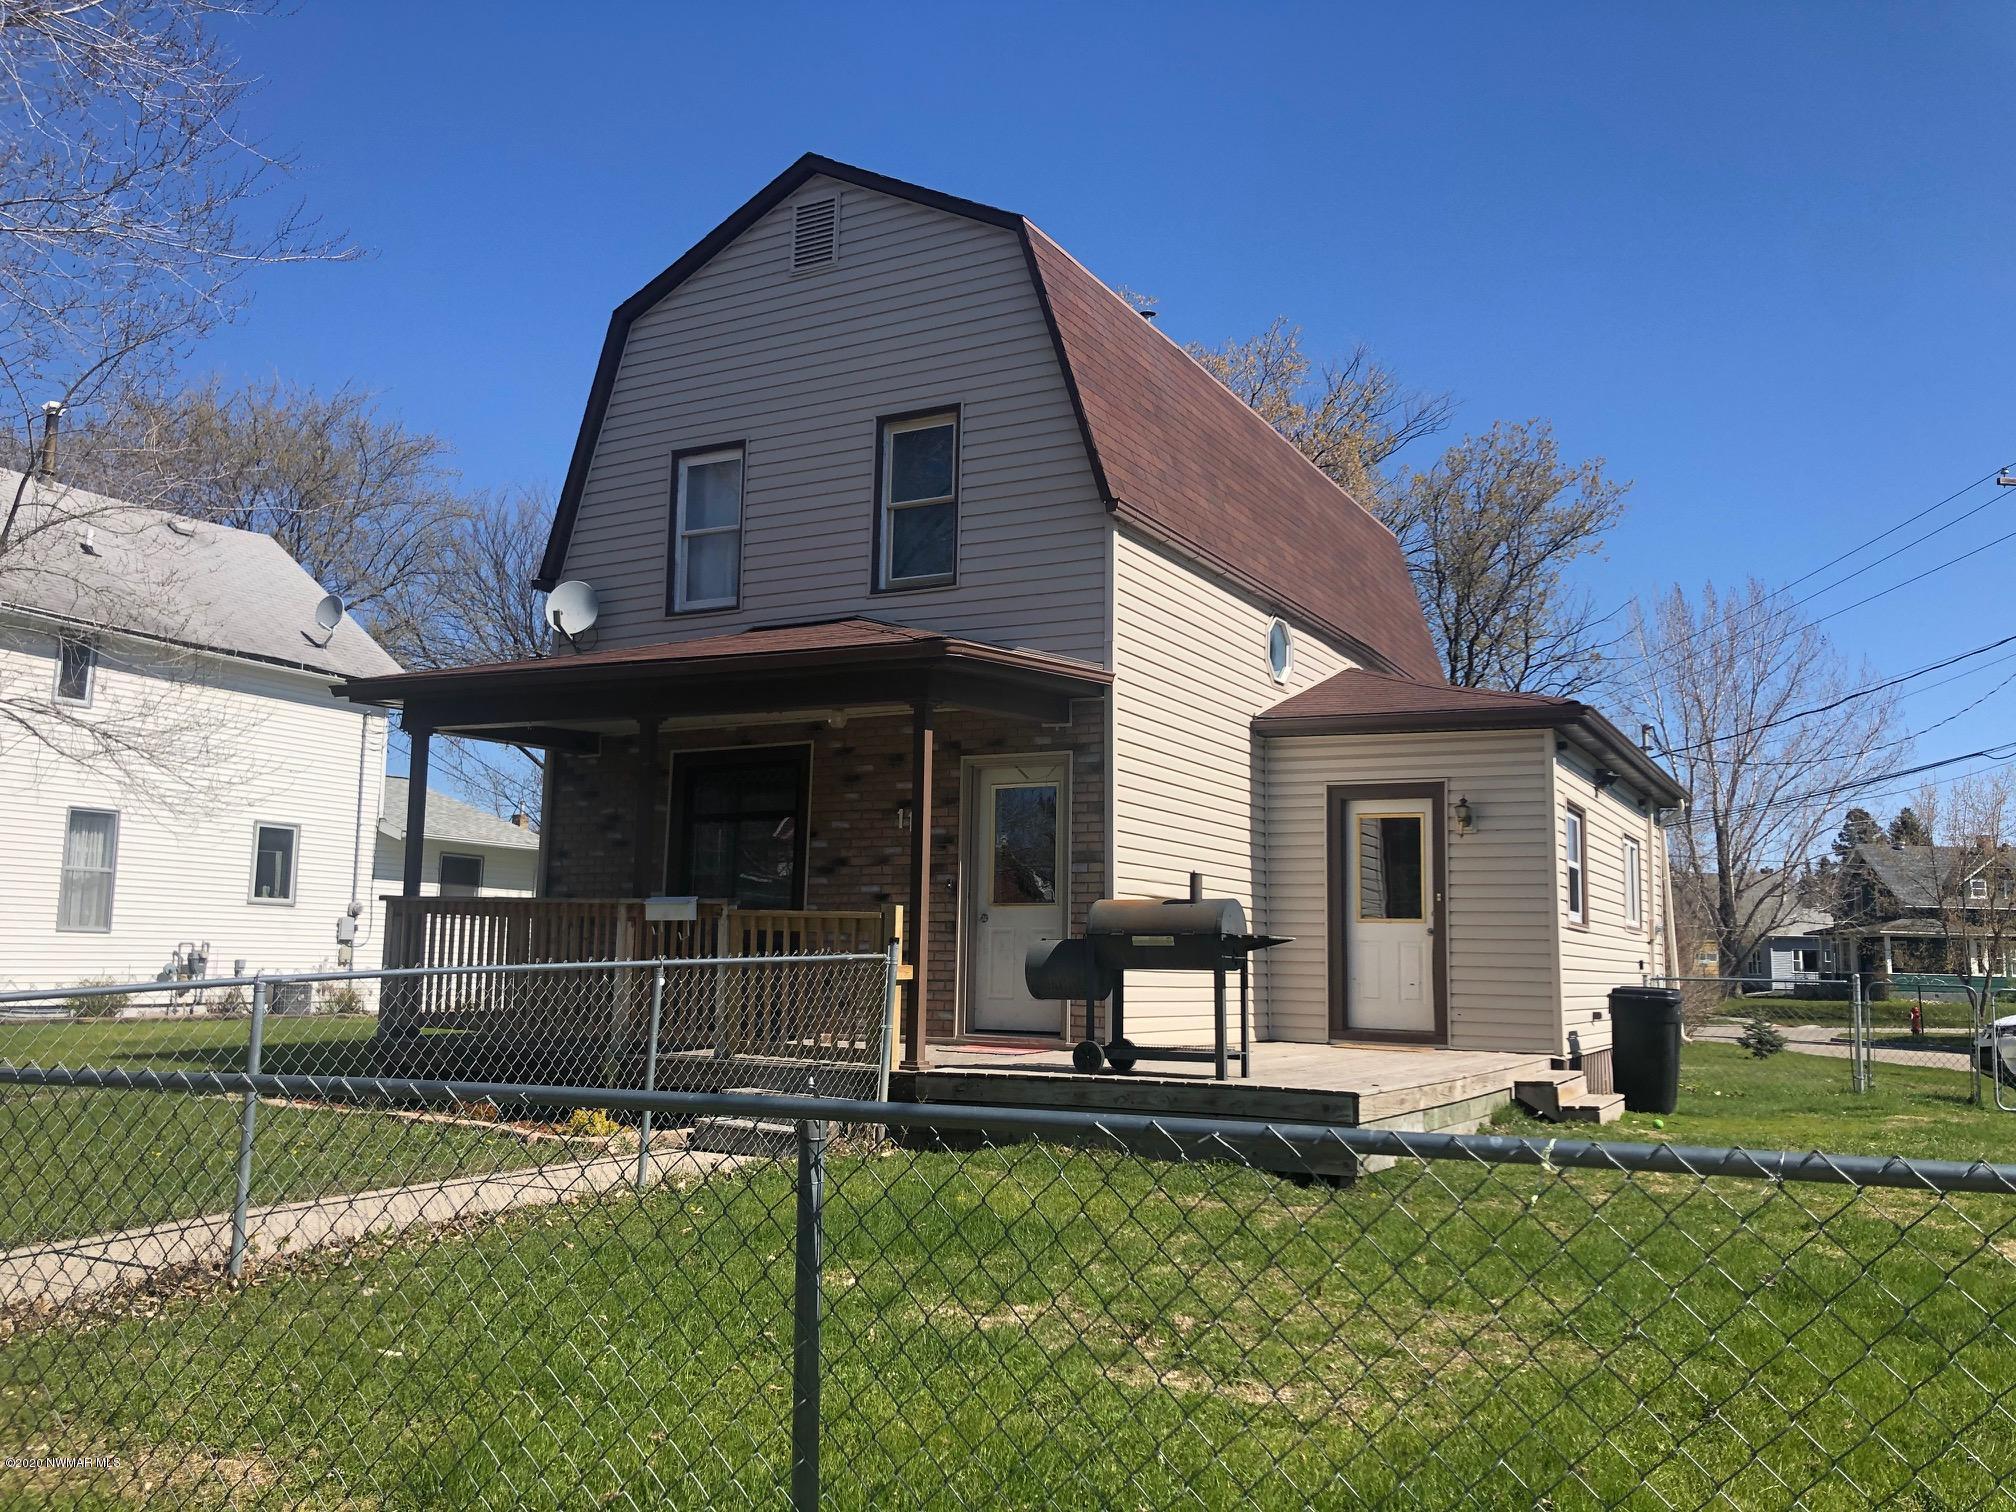 115 9th Property Photo - Crookston, MN real estate listing